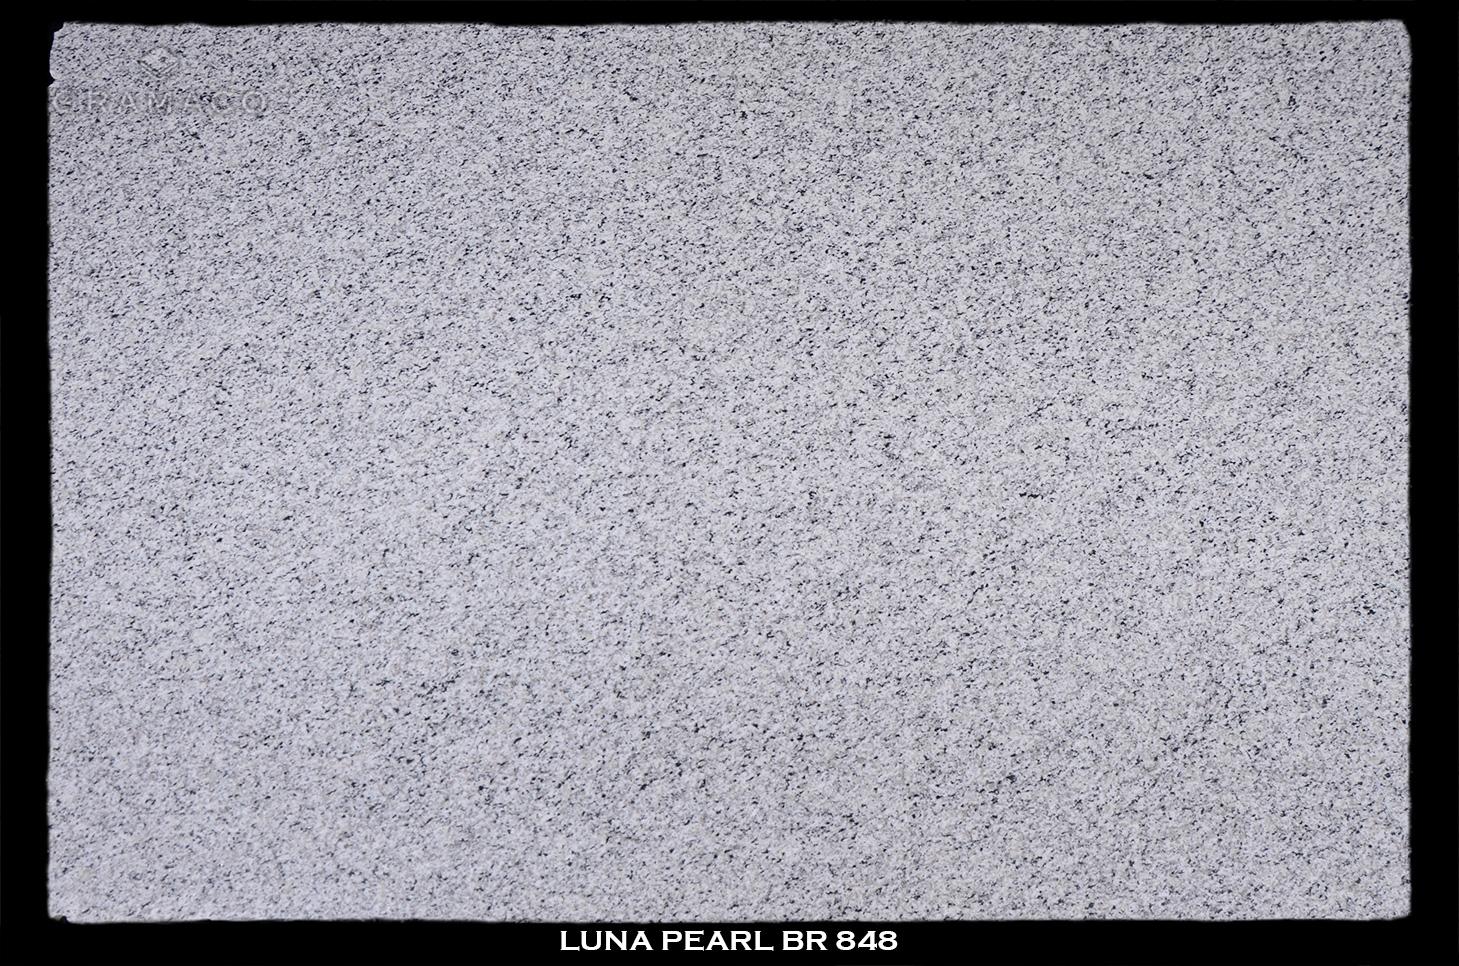 luna-pearl-848-slab